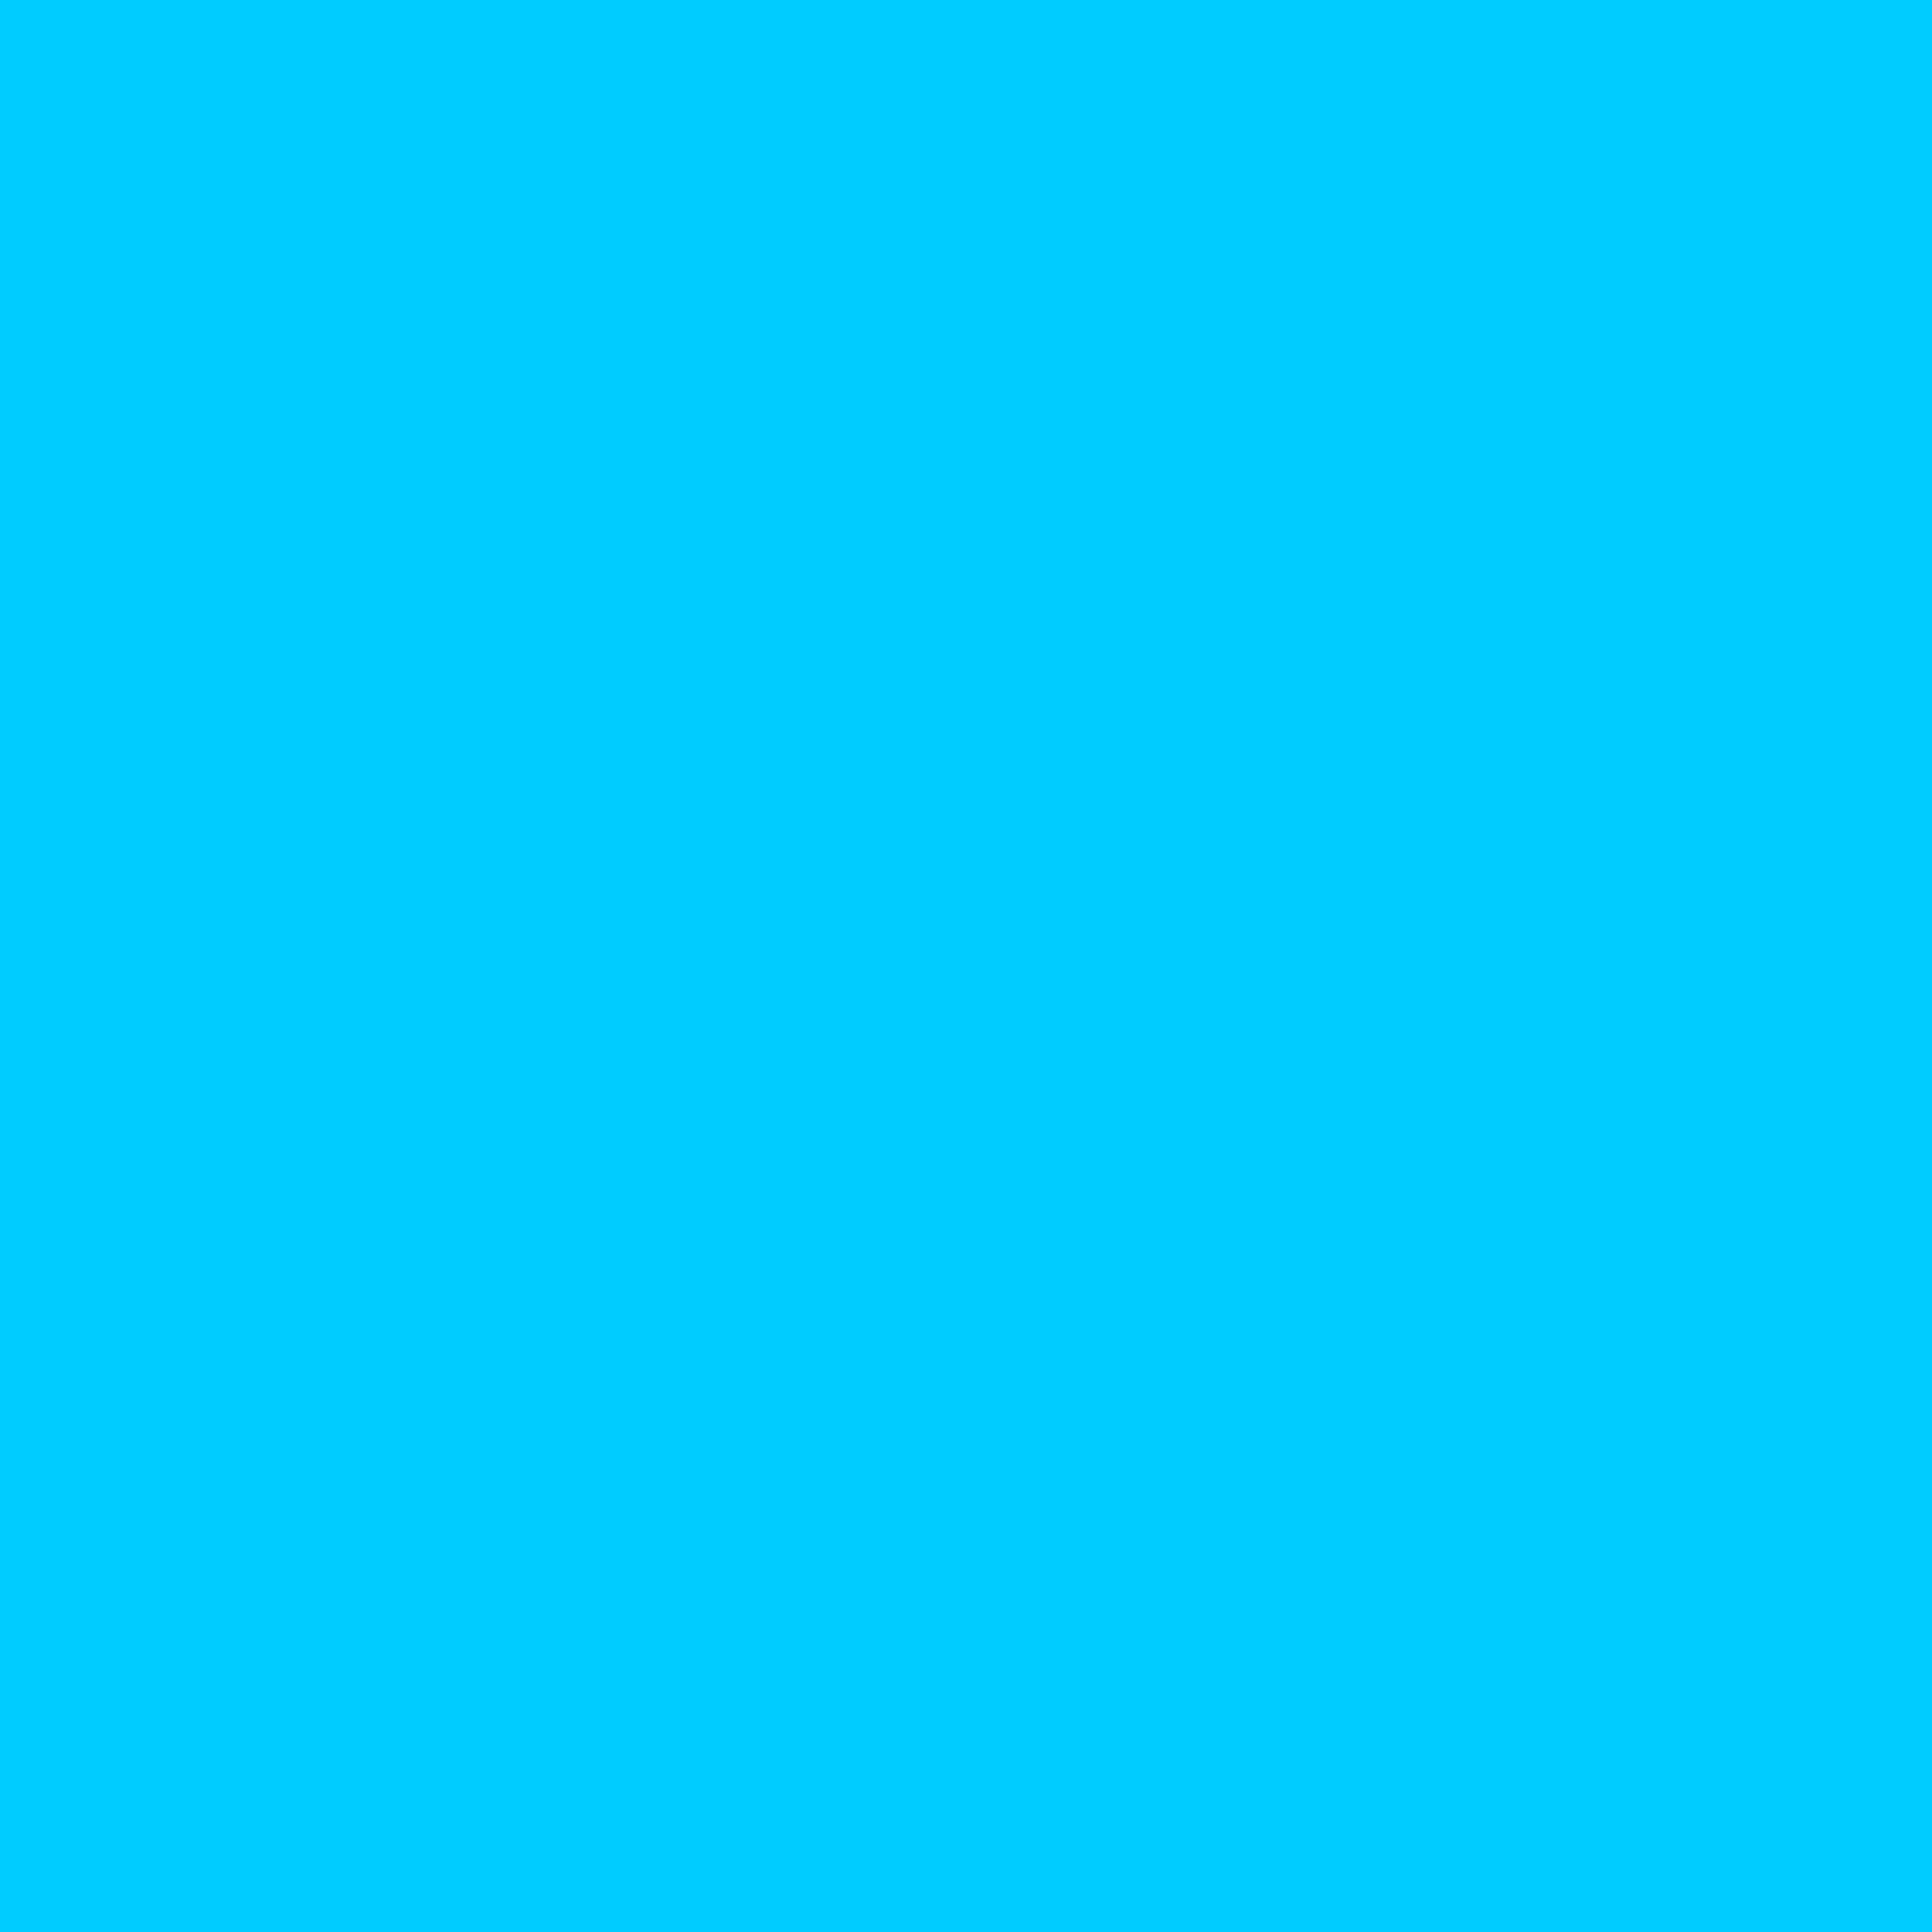 2048x2048 Vivid Sky Blue Solid Color Background